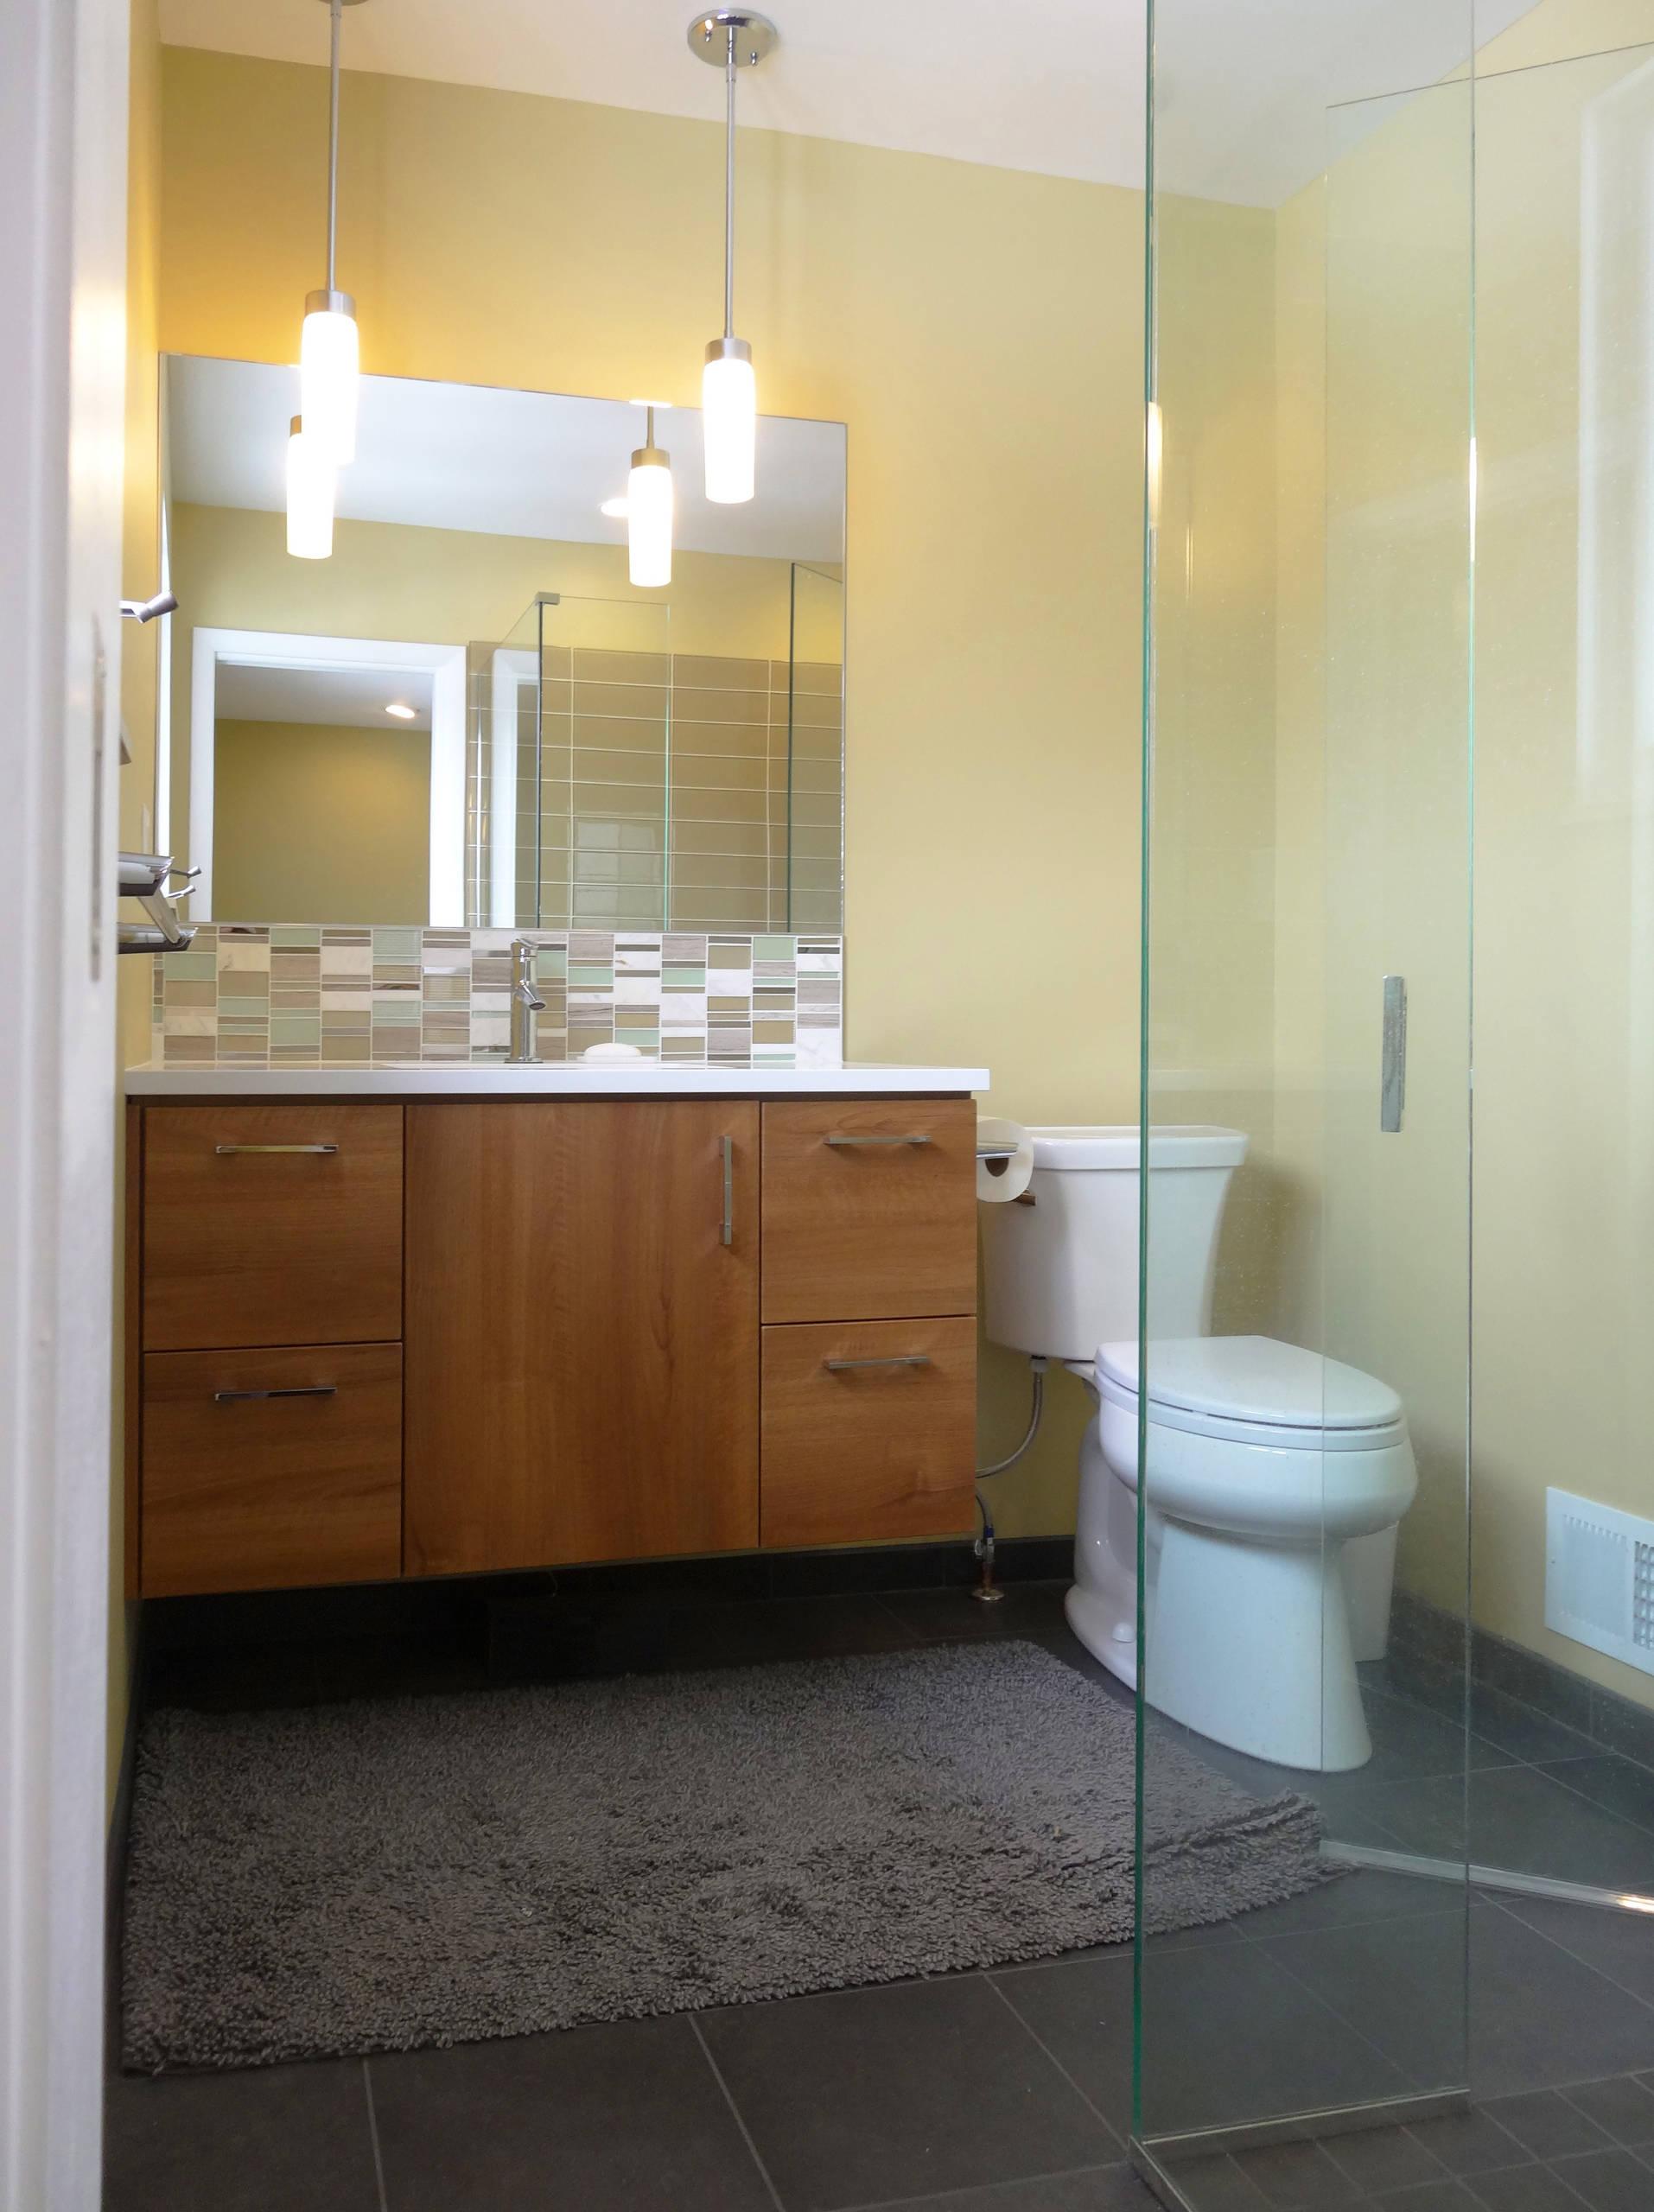 75 Beautiful Mid Century Modern Green Tile Bathroom Pictures Ideas September 2021 Houzz